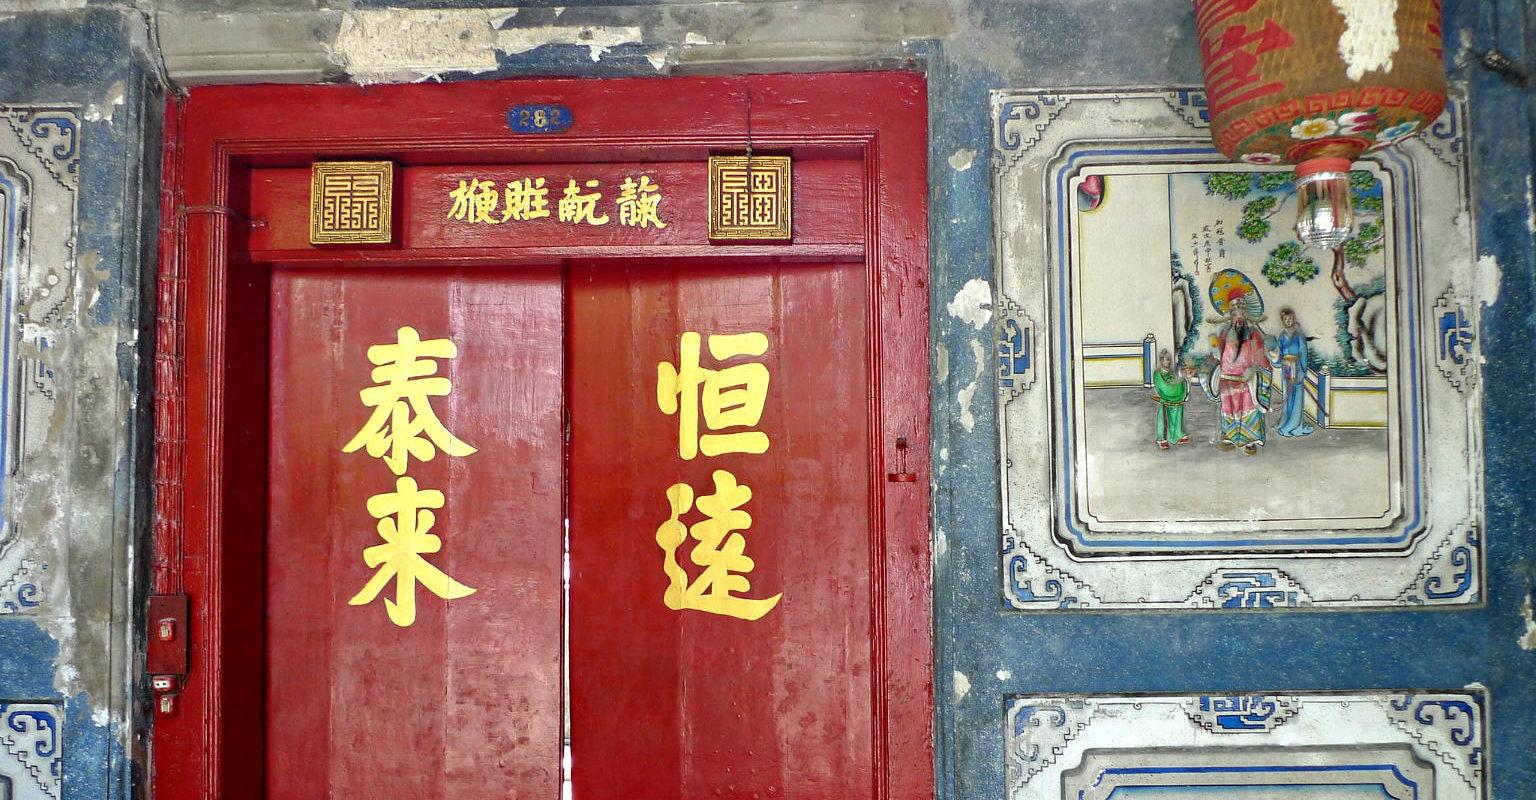 rode deur met gouden letters van Soi Heng Tai Mansion in Chinatown Bangkok